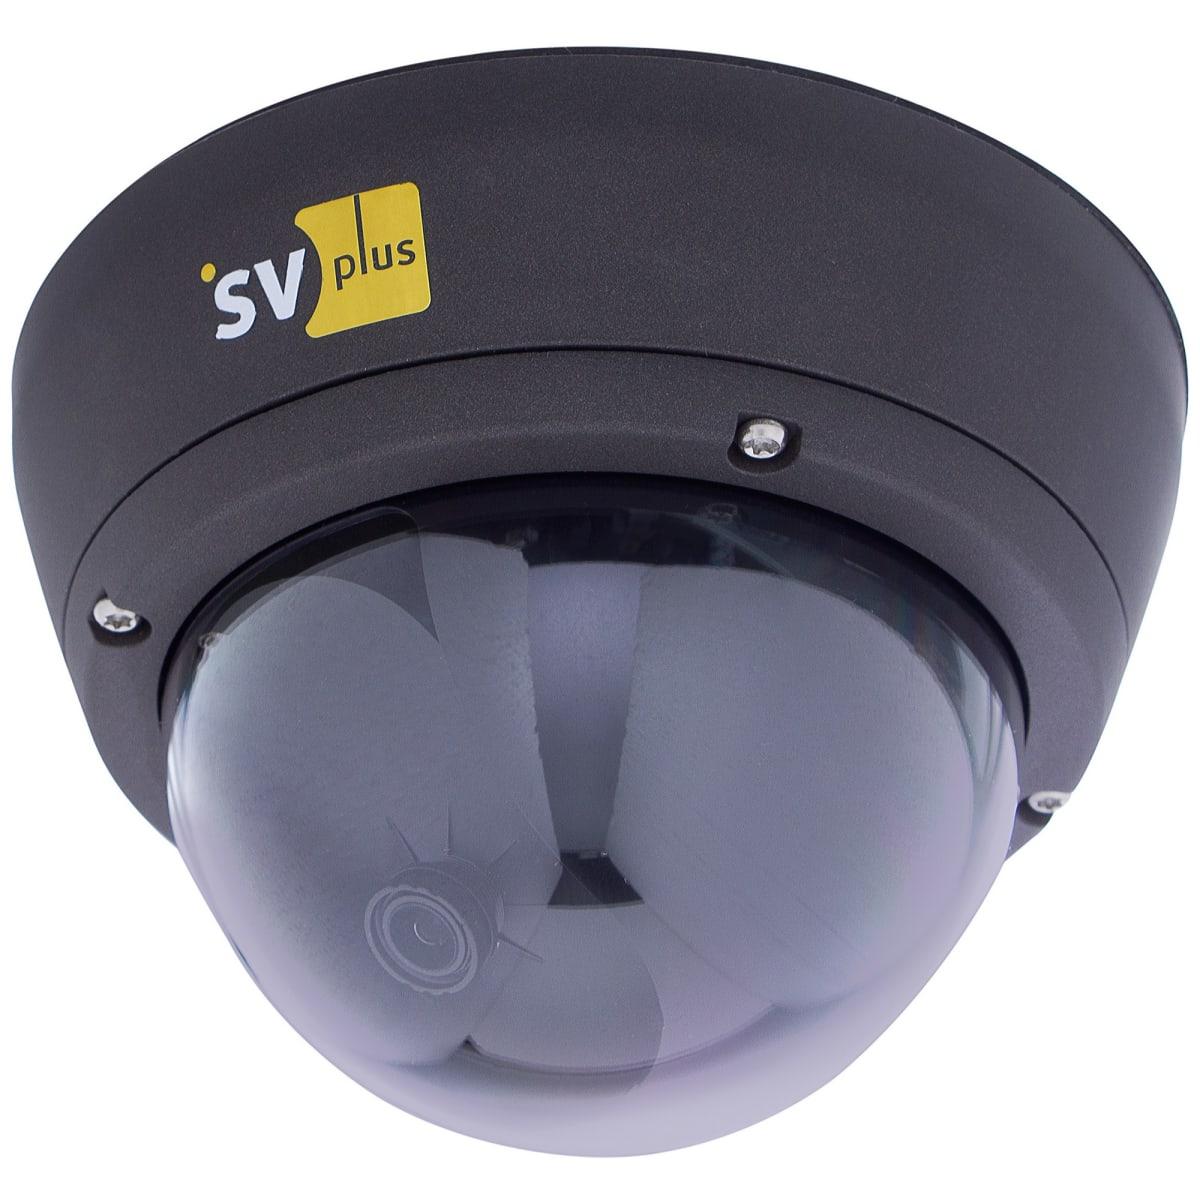 IP Камера антивандальная  SVIP-3032W с WiFi, Full HD